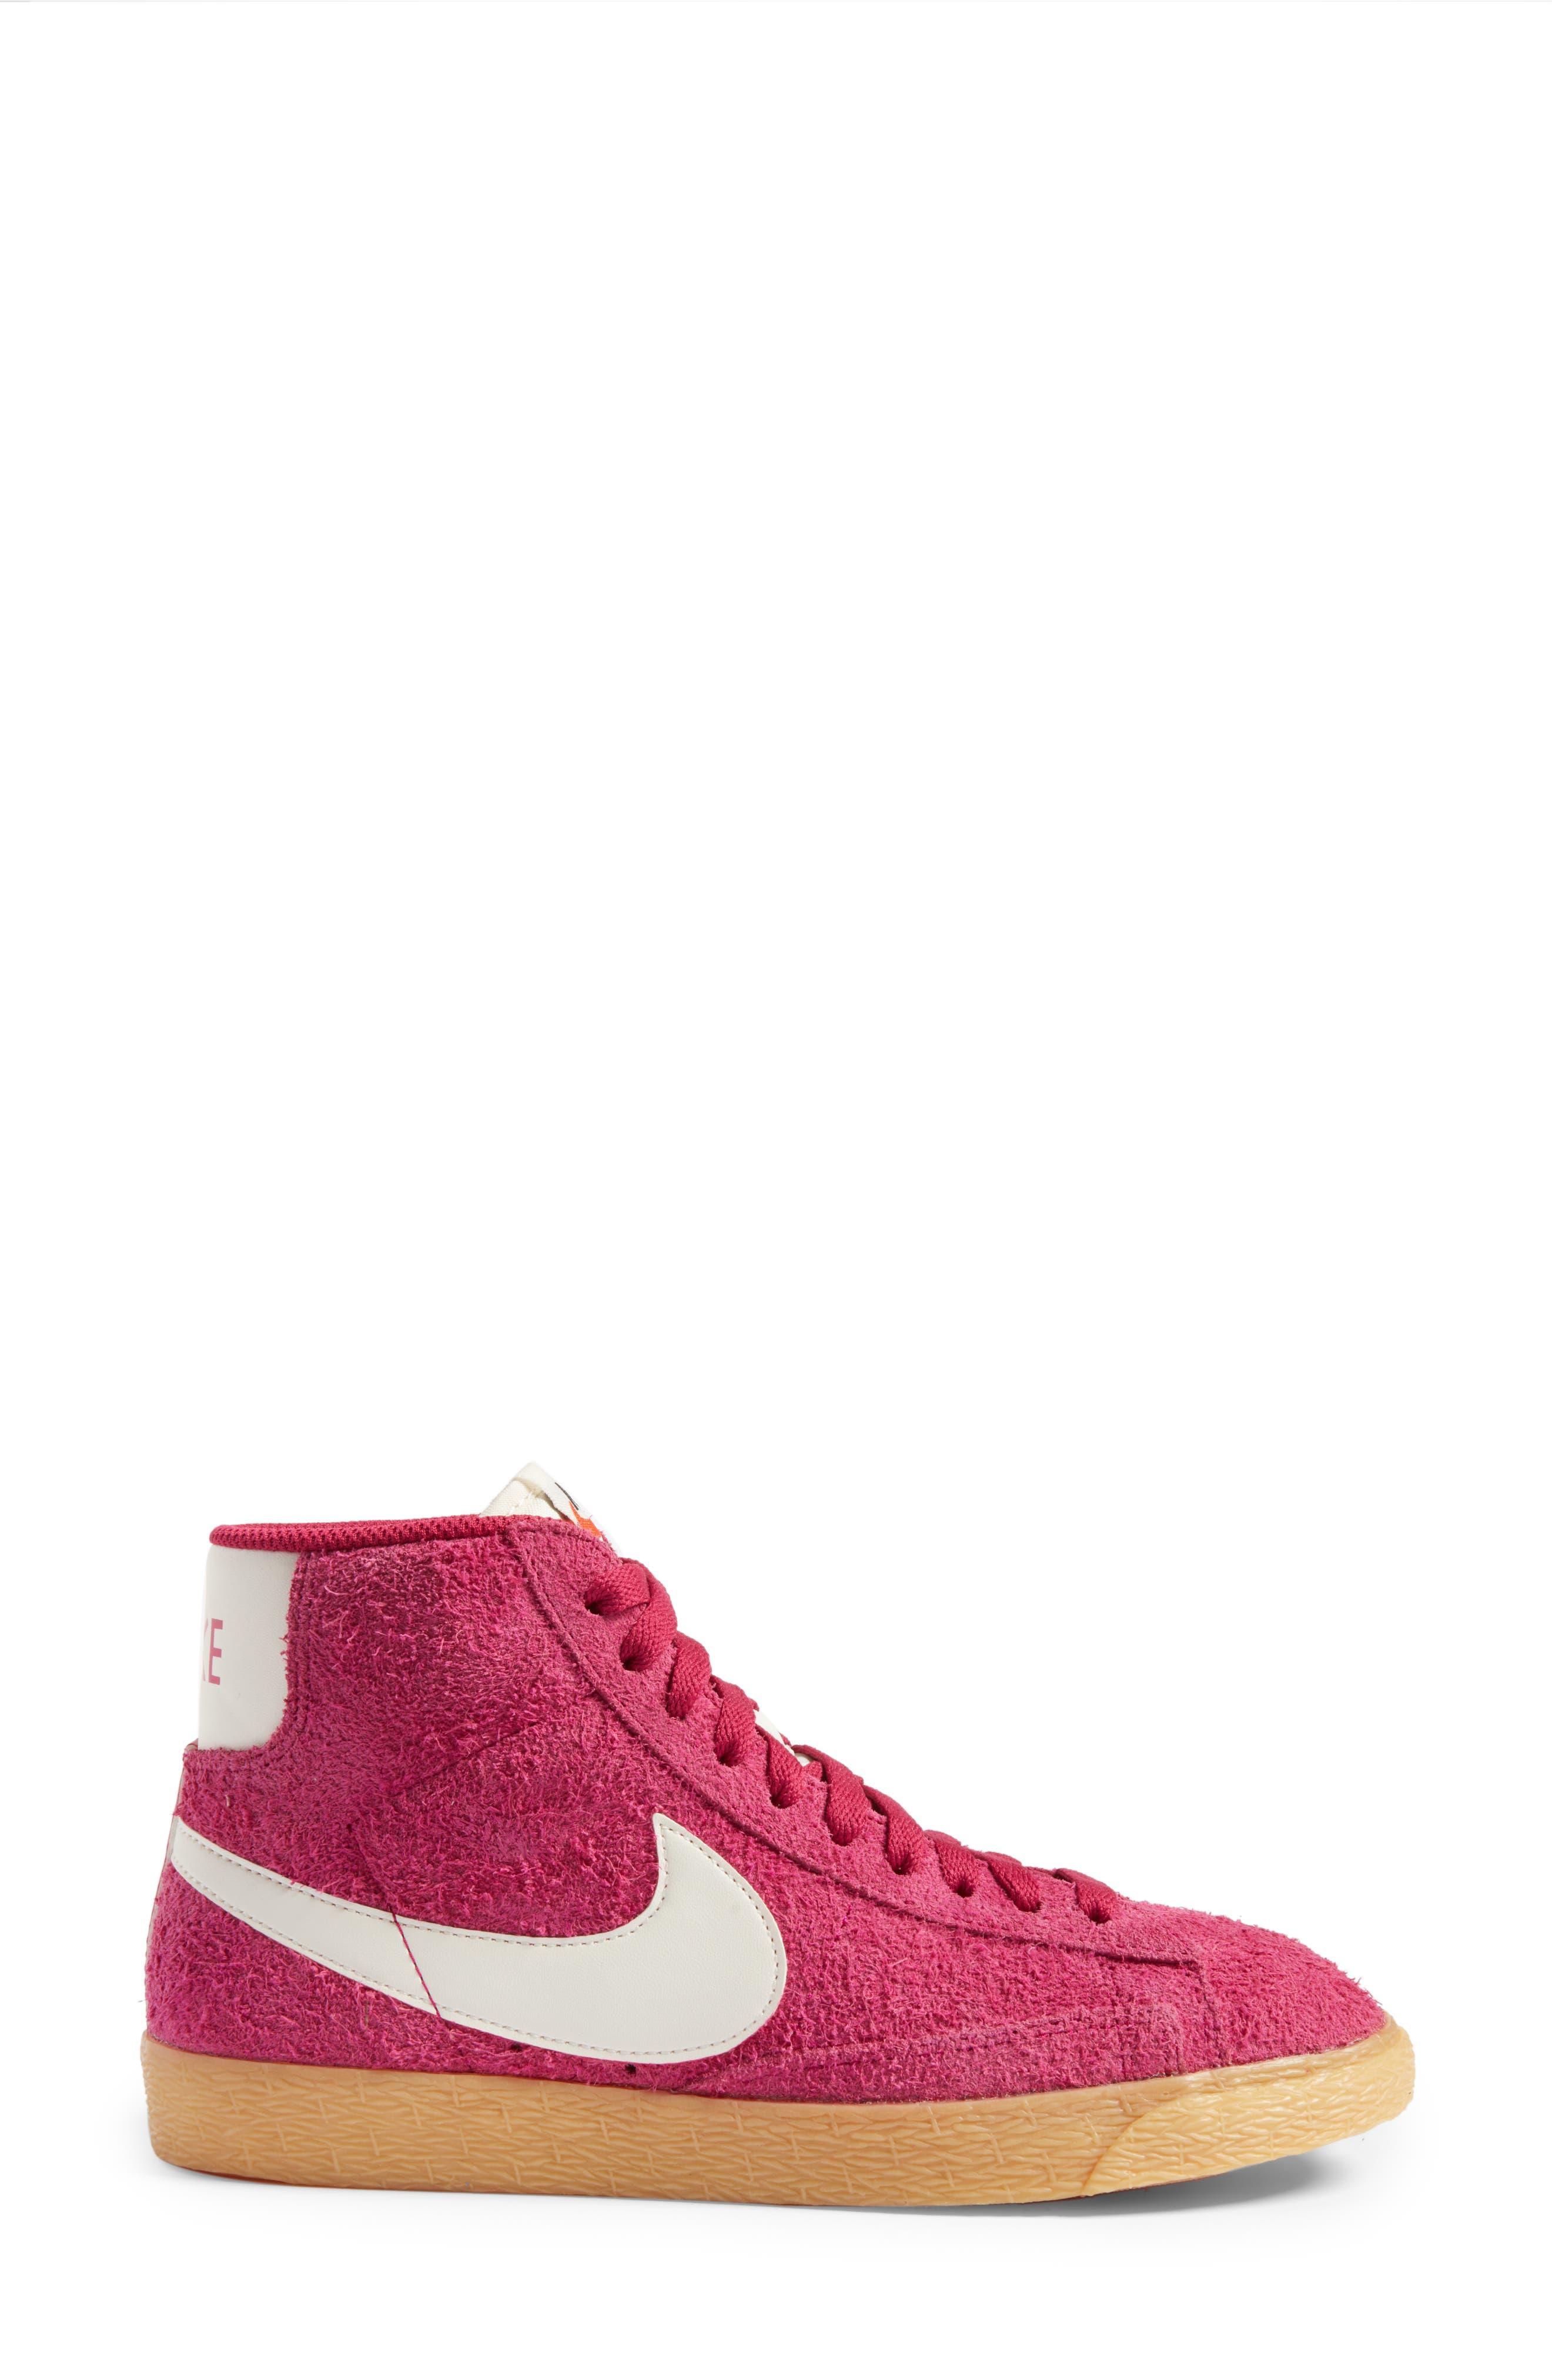 Alternate Image 3  - Nike 'Blazer' Vintage High Top Basketball Sneaker (Women)